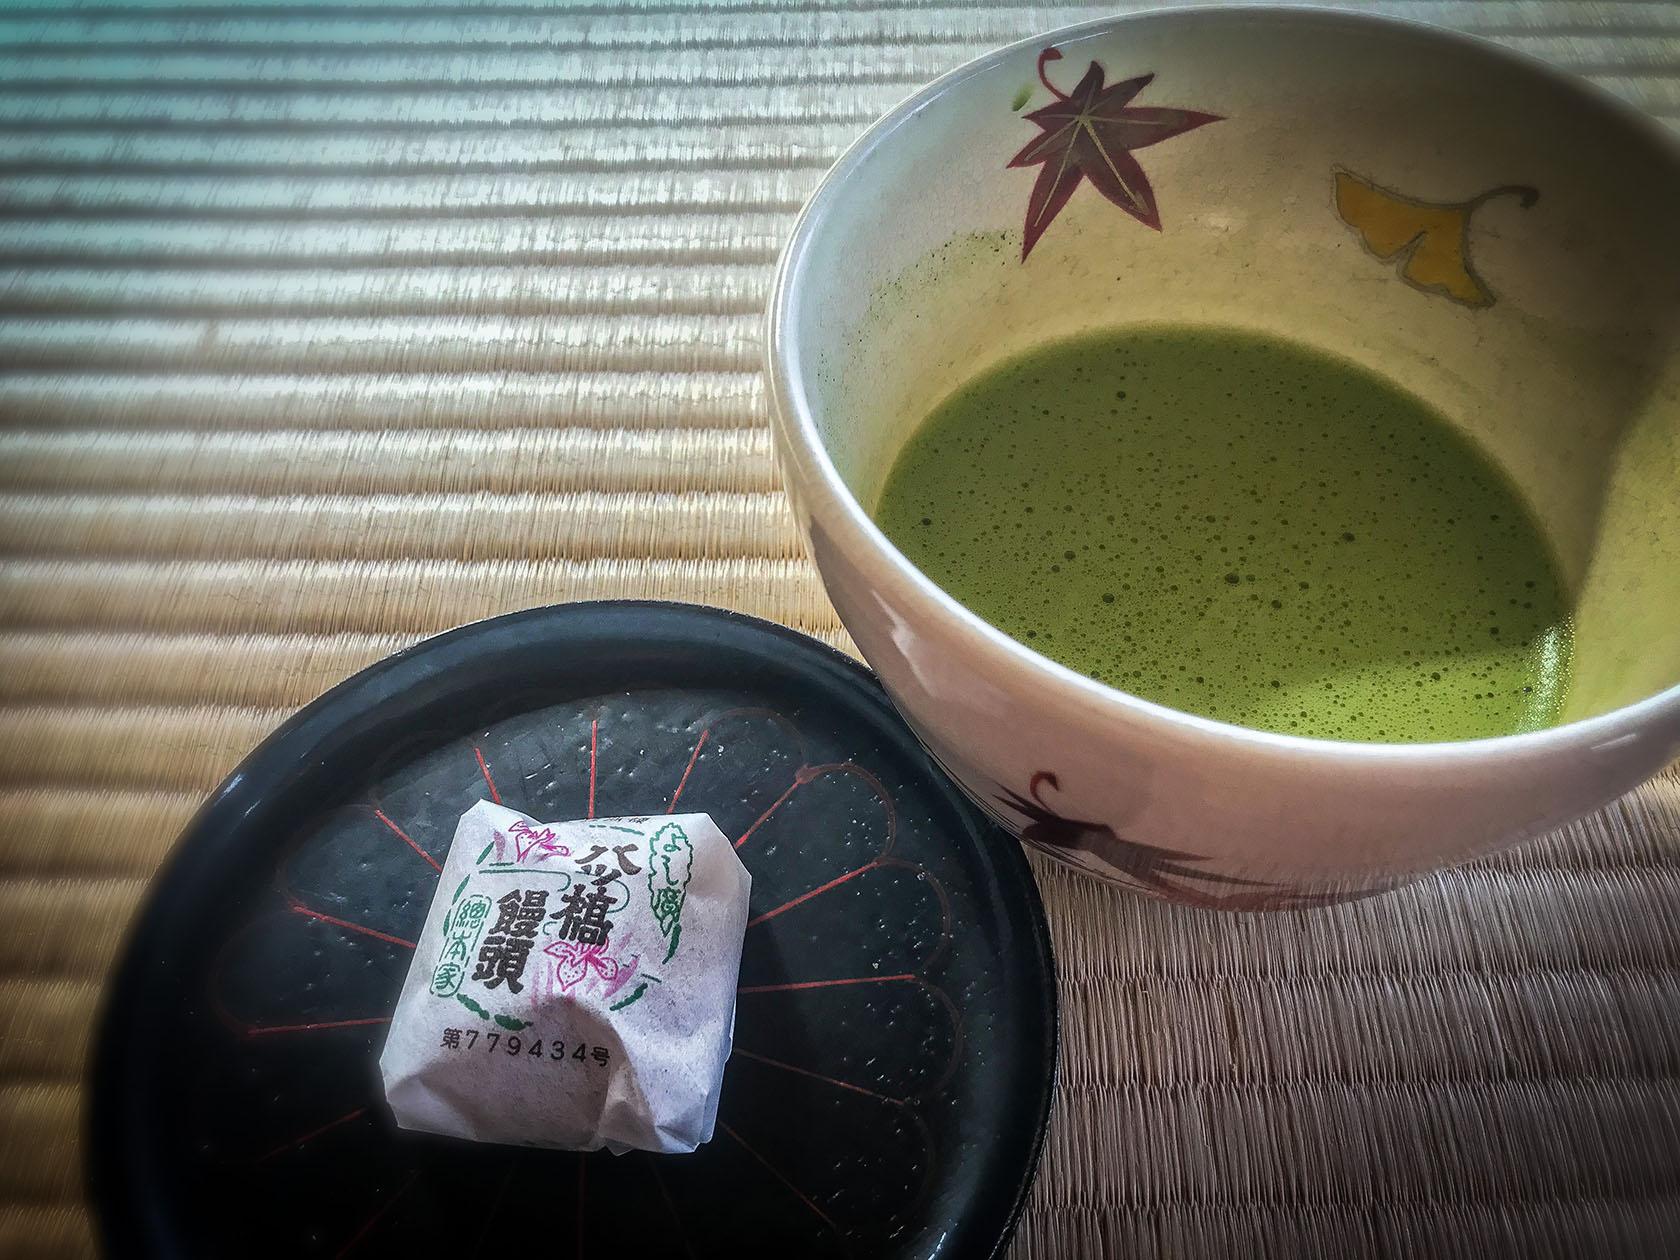 matcha and tatami